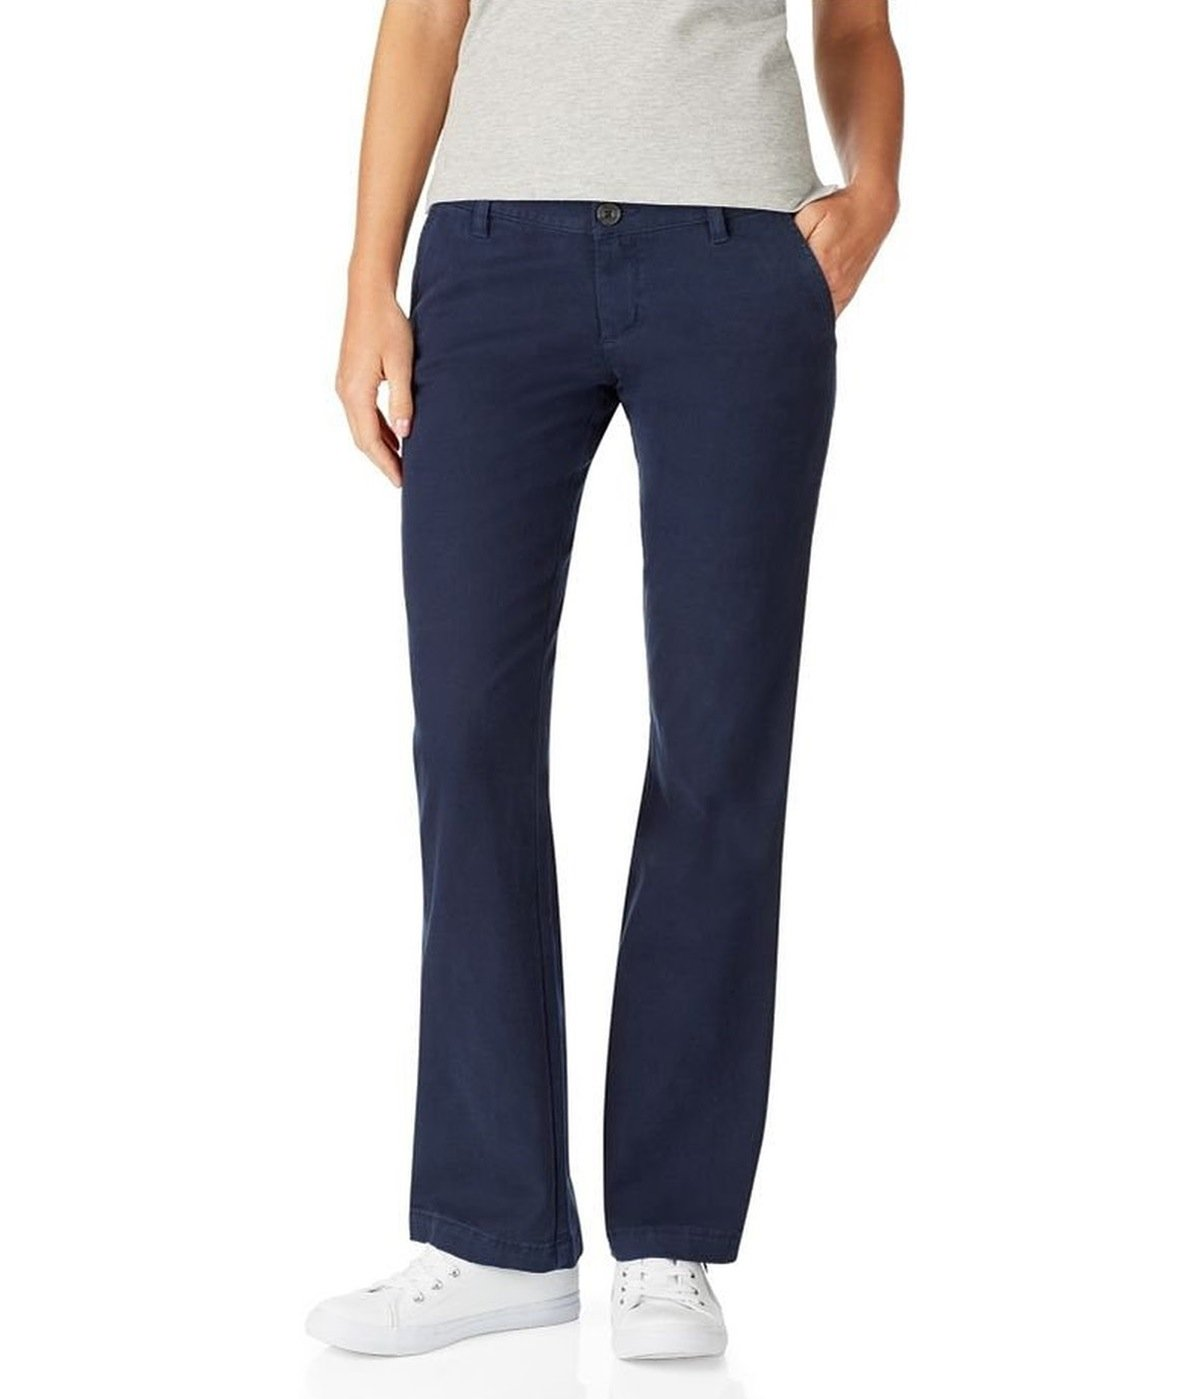 Aeropostale Womens Khaki Chino Pants 404 0S